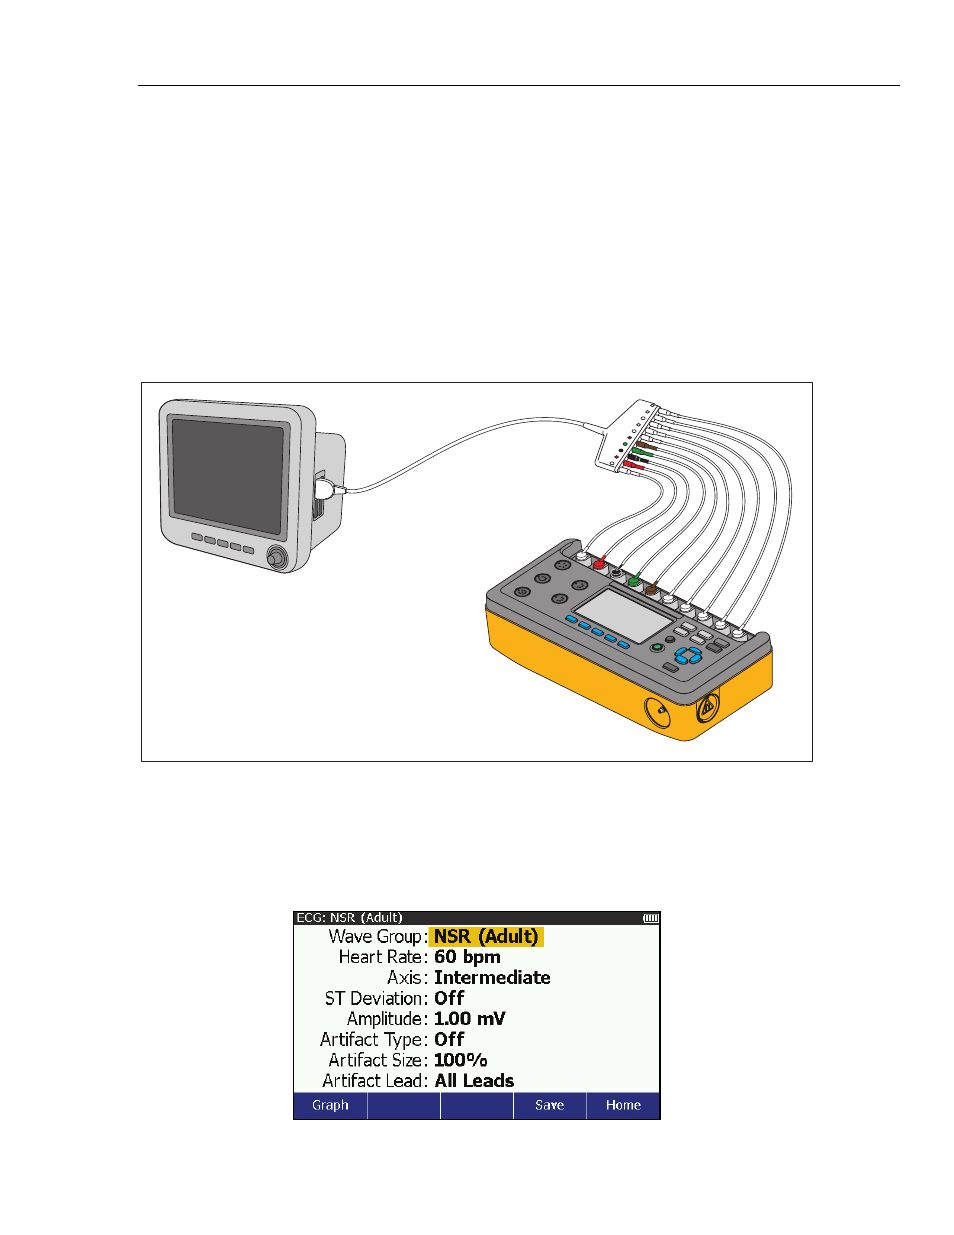 Ecg function, How to set the ecg parameters   Fluke Biomedical